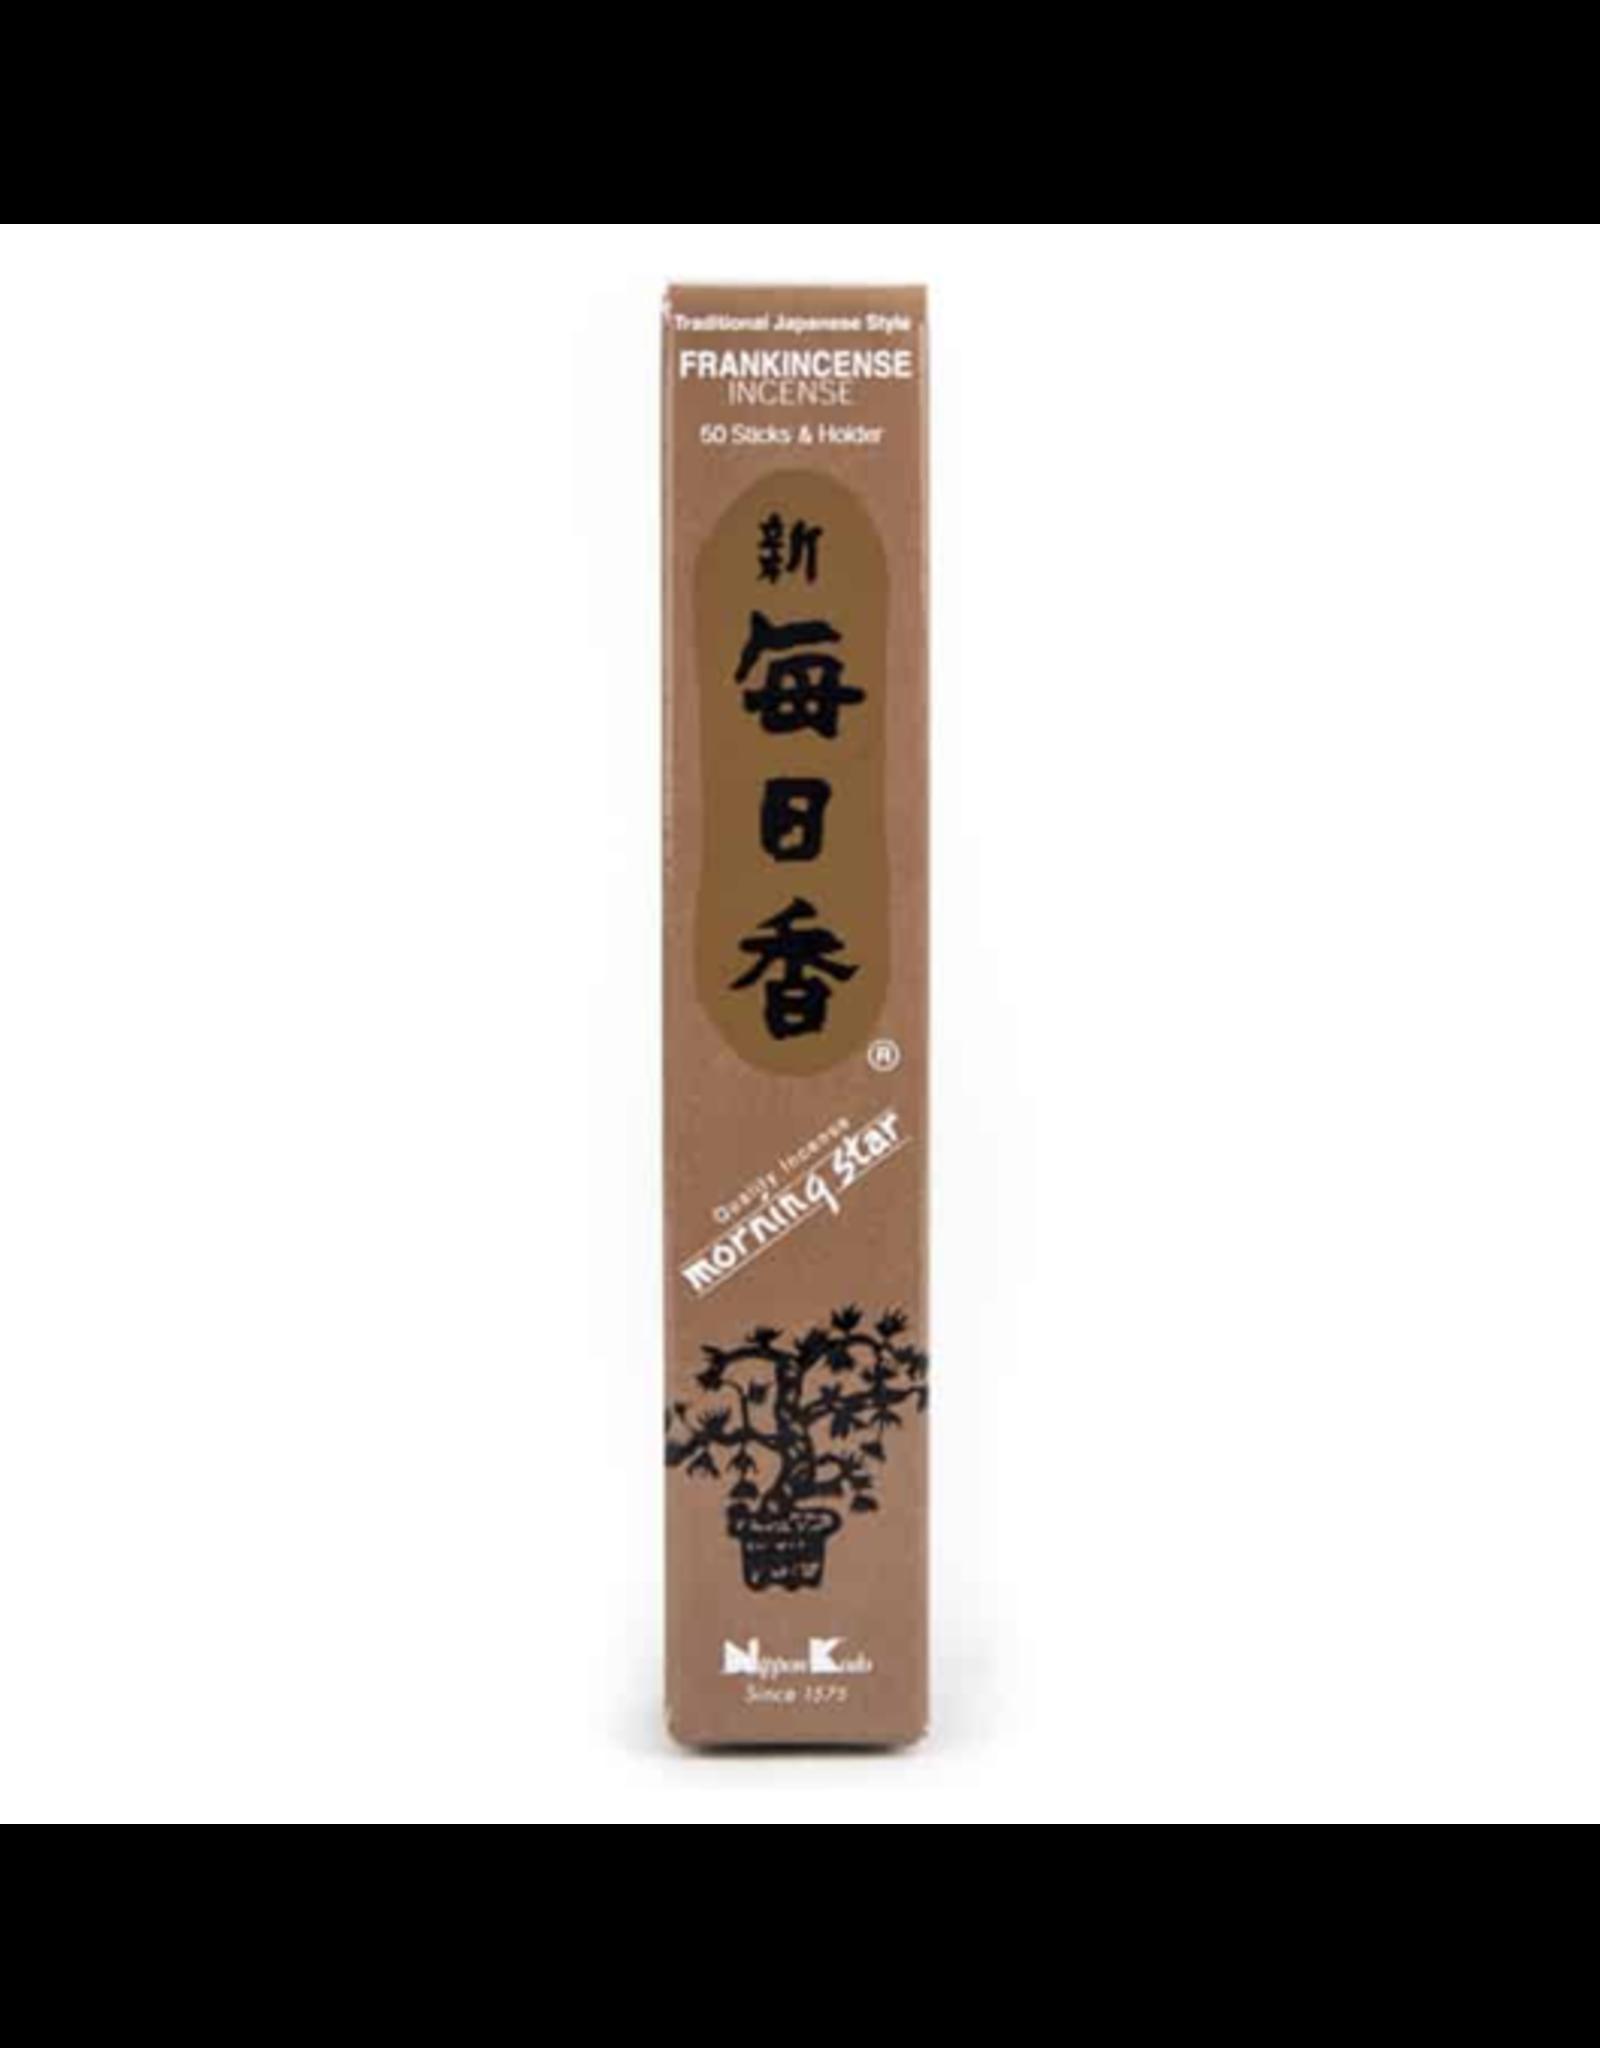 Nippon Kodo Morning Star Frankincense